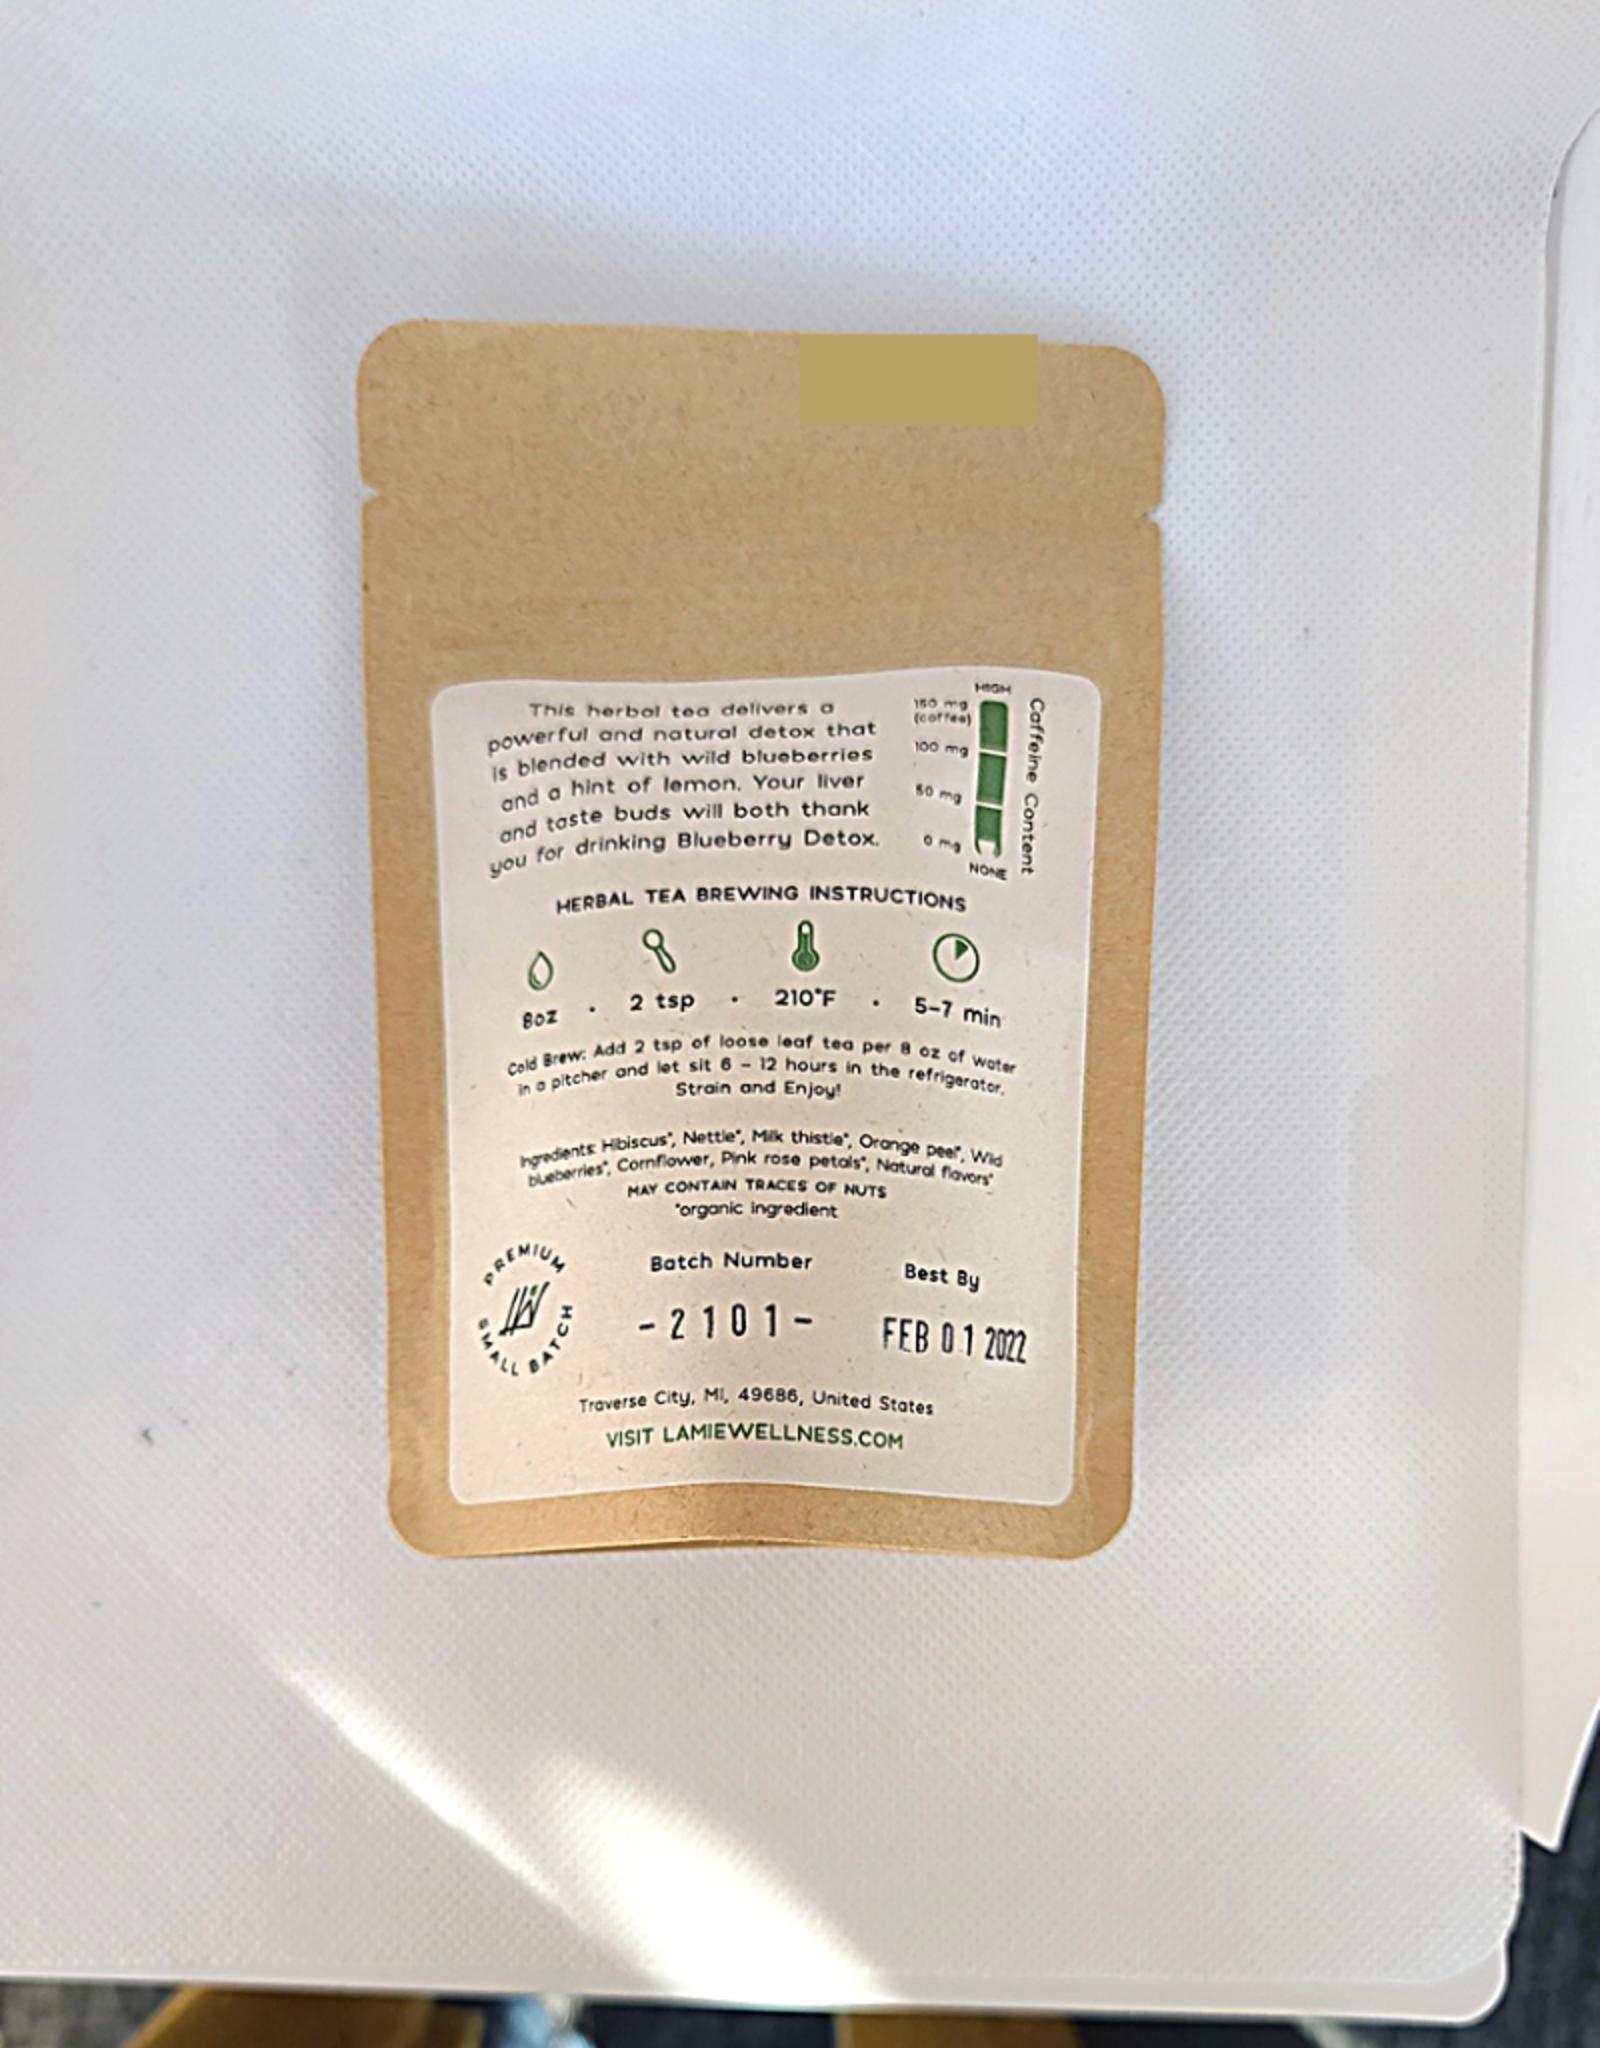 Lamie Wellness - Blueberry Detox Herbal Tea - 1oz